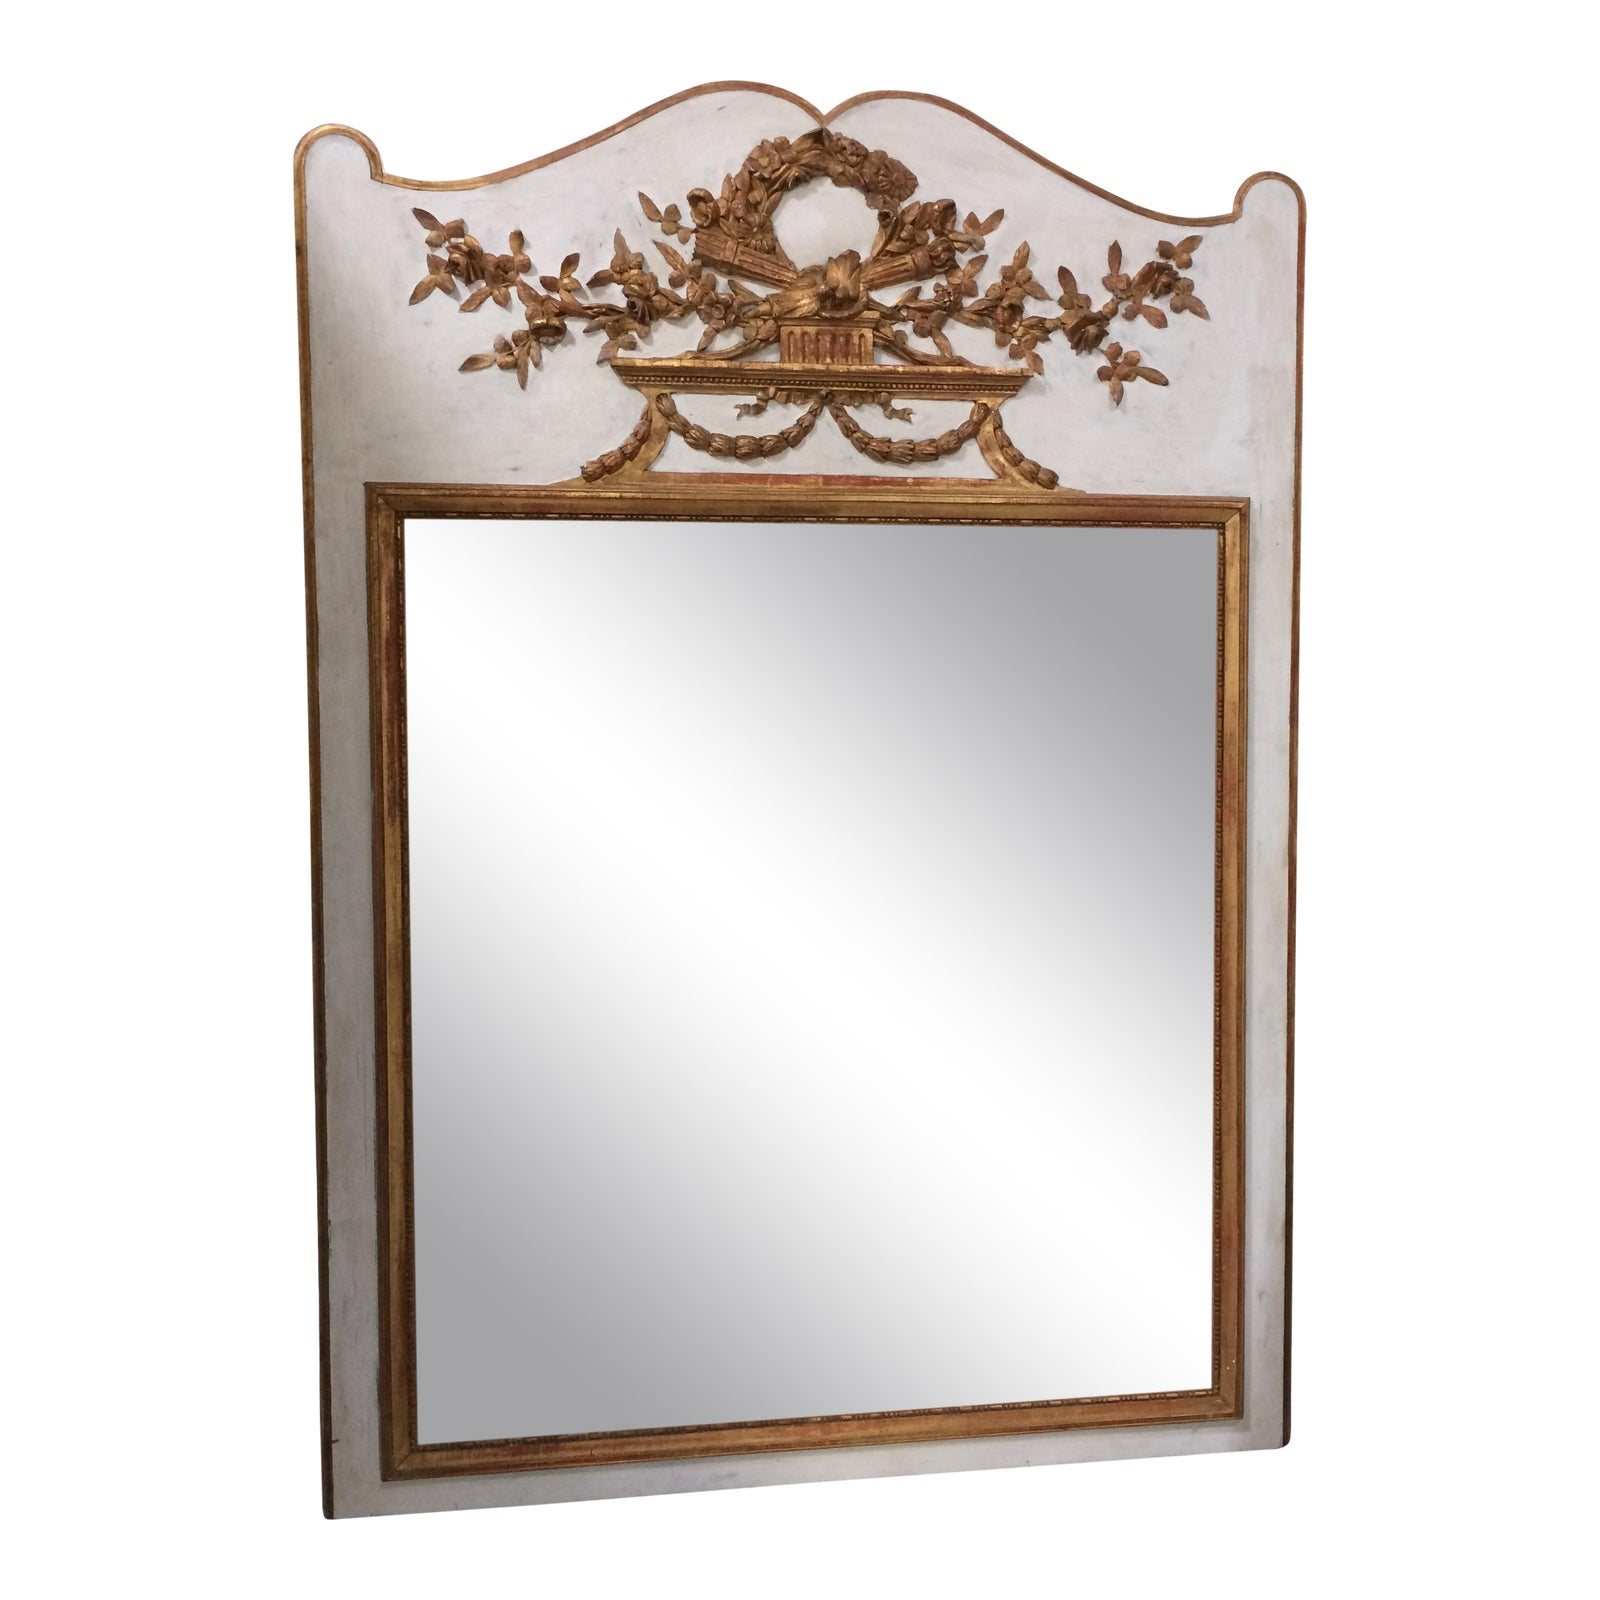 18th Century French Trumeau Mirror Chairish